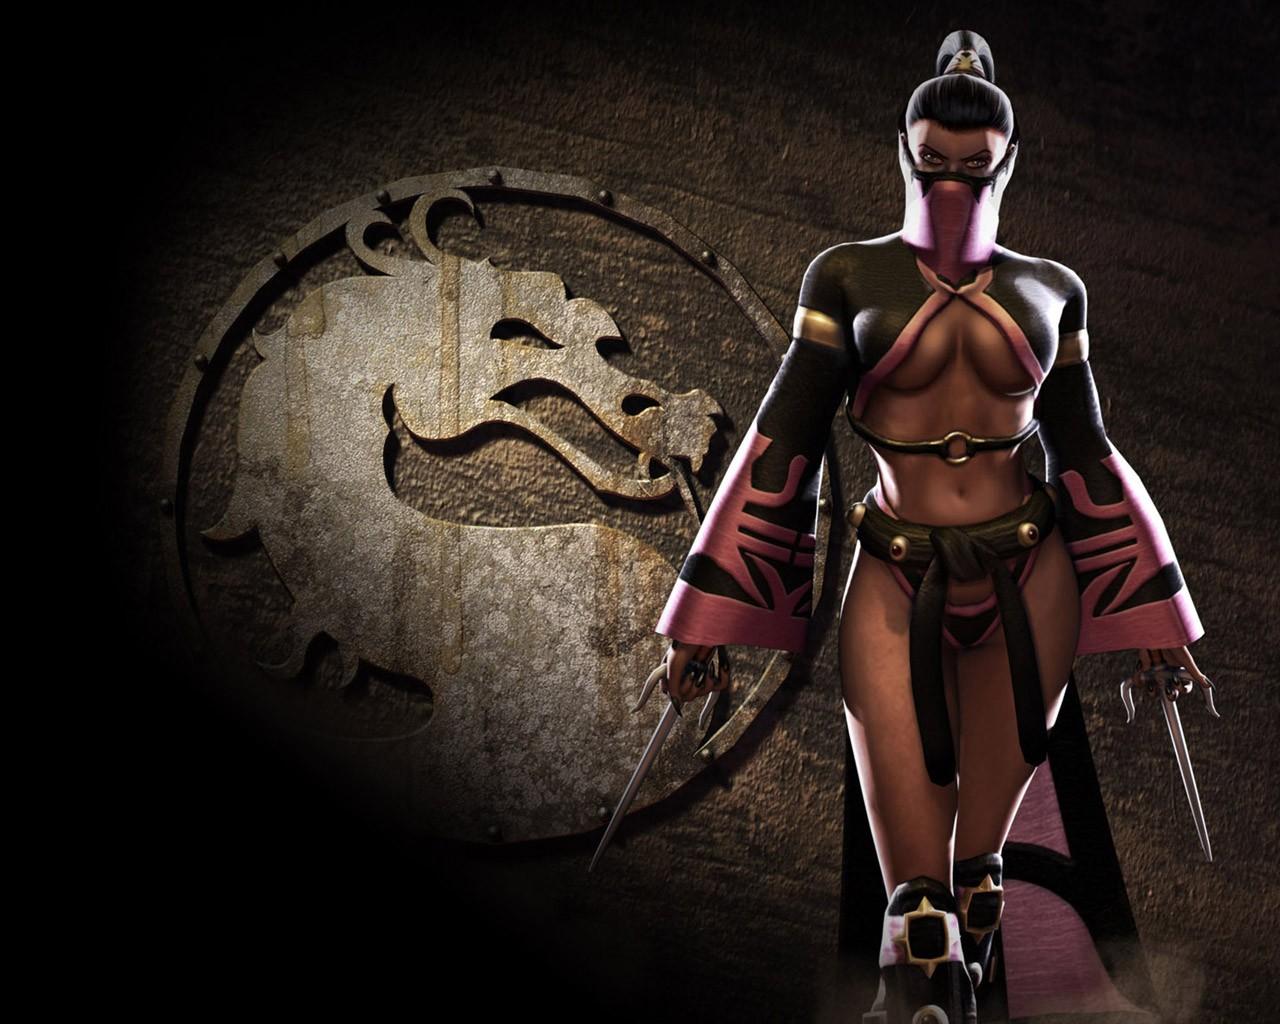 General 1280x1024 Mortal Kombat Mileena Mileena (Mortal Kombat) video games